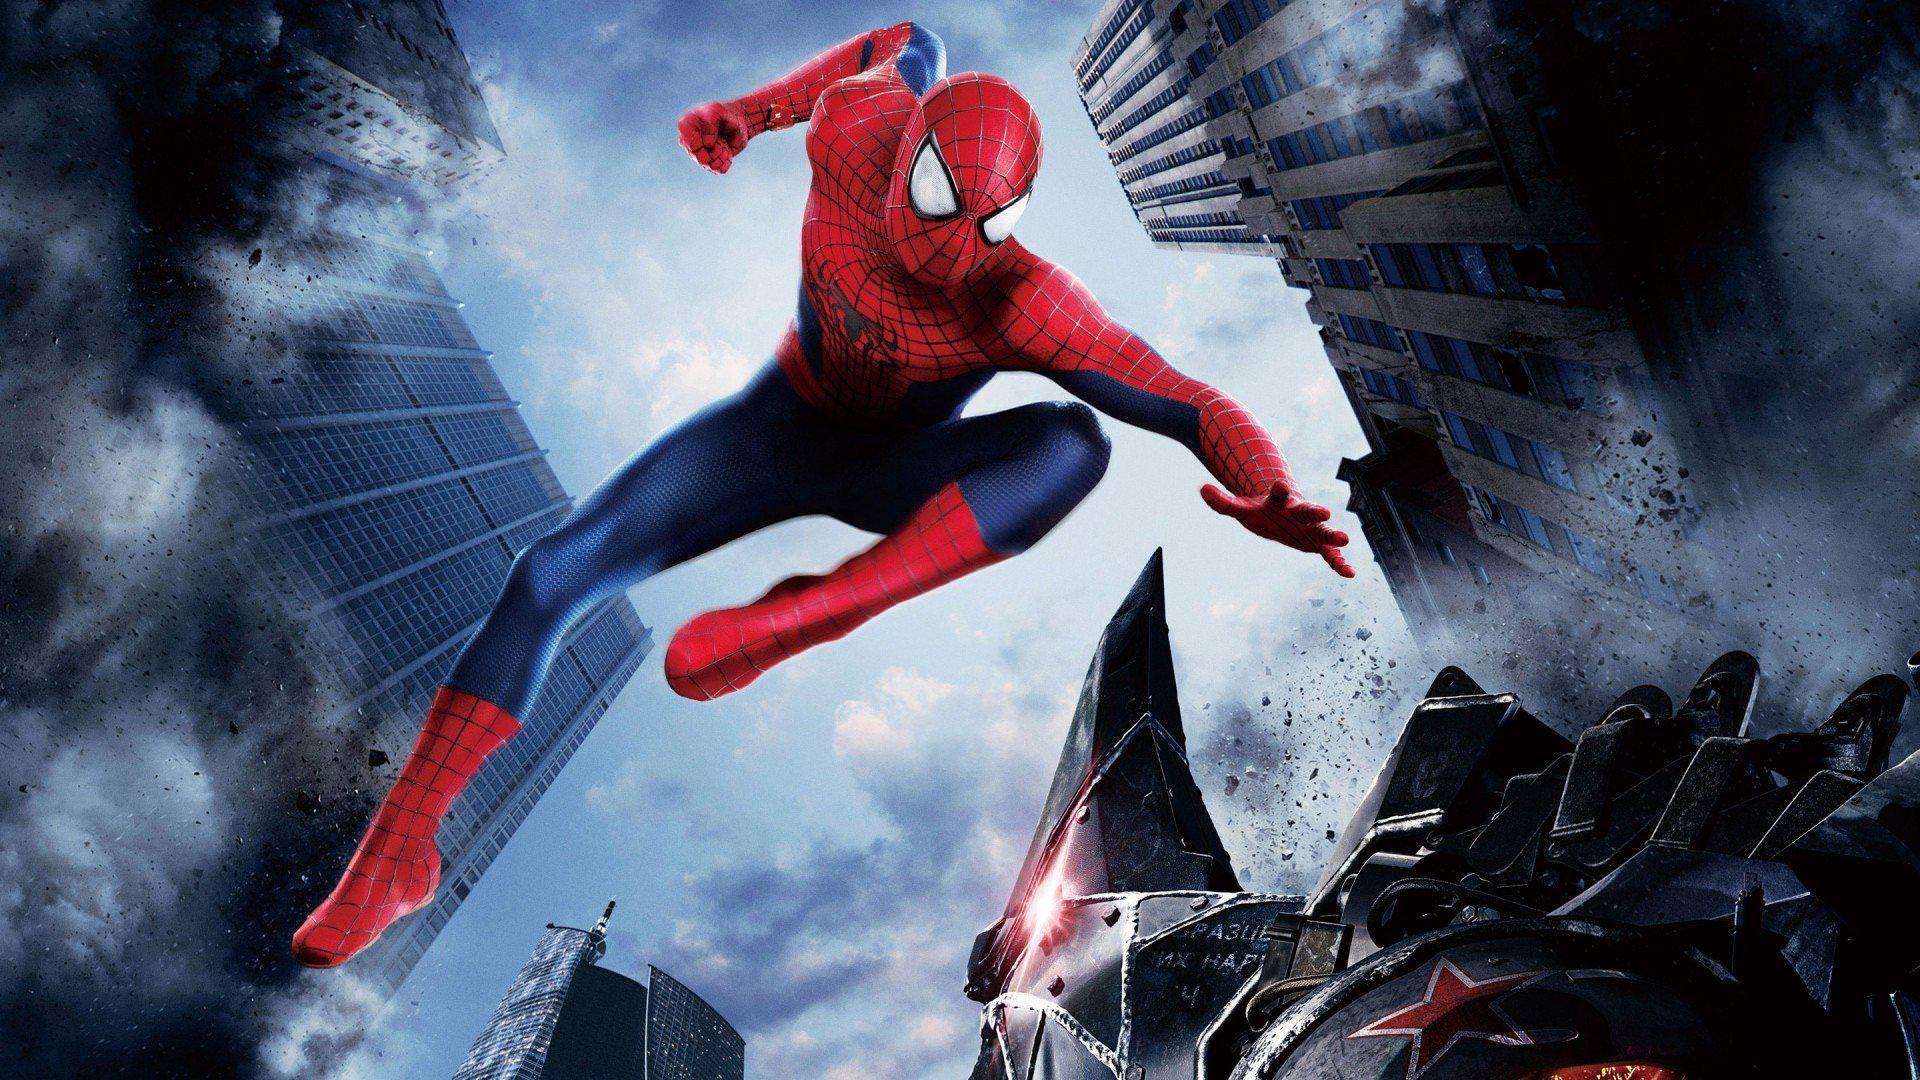 15 Best HD Superhero Movie WallpapersFreeCreatives 1920x1080